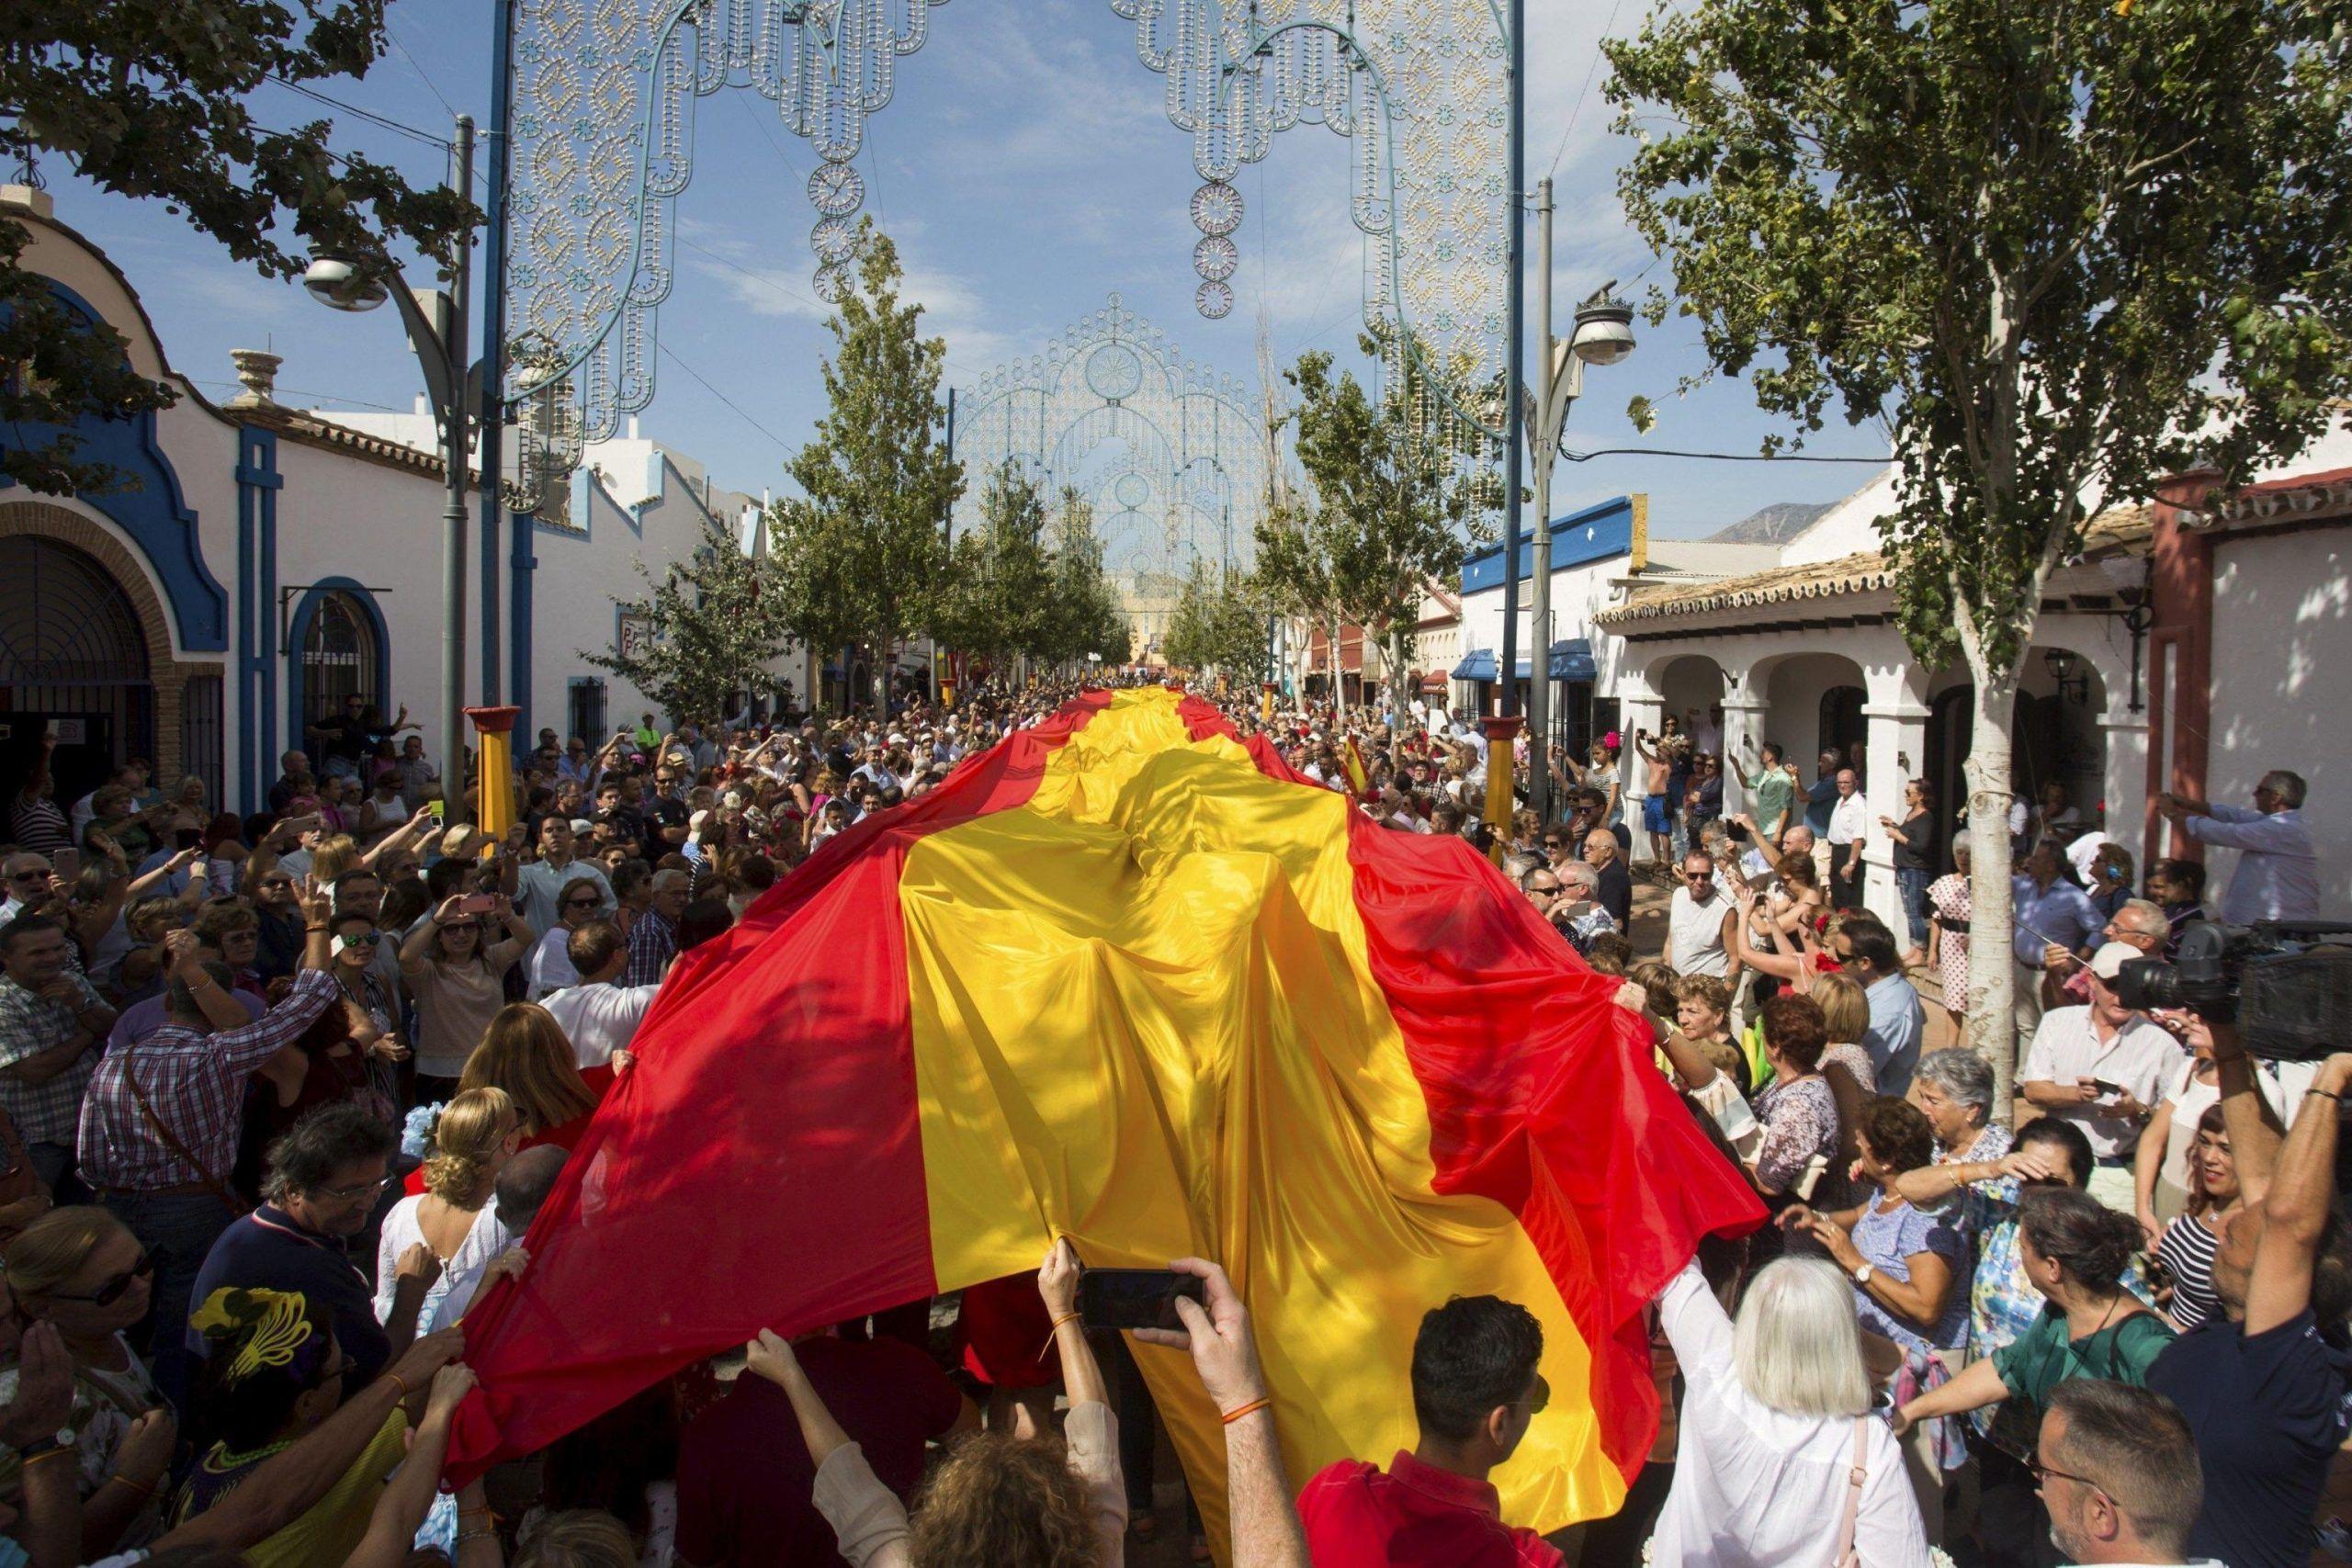 Spain's National Day celebration in Malaga